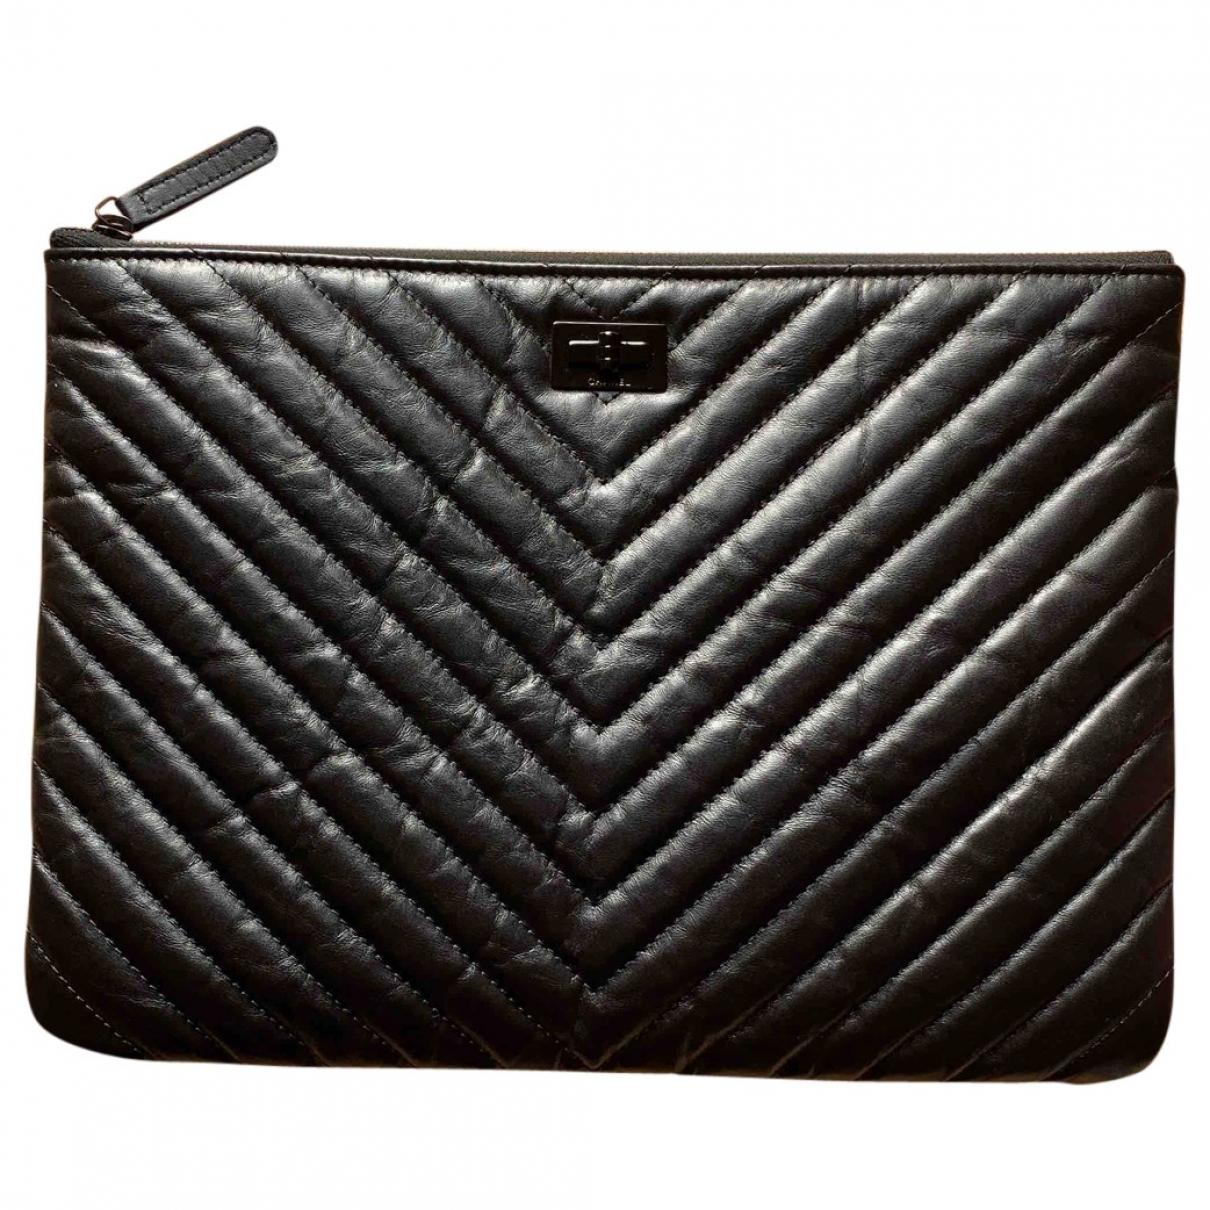 Chanel 2.55 Black Leather Clutch bag for Women \N